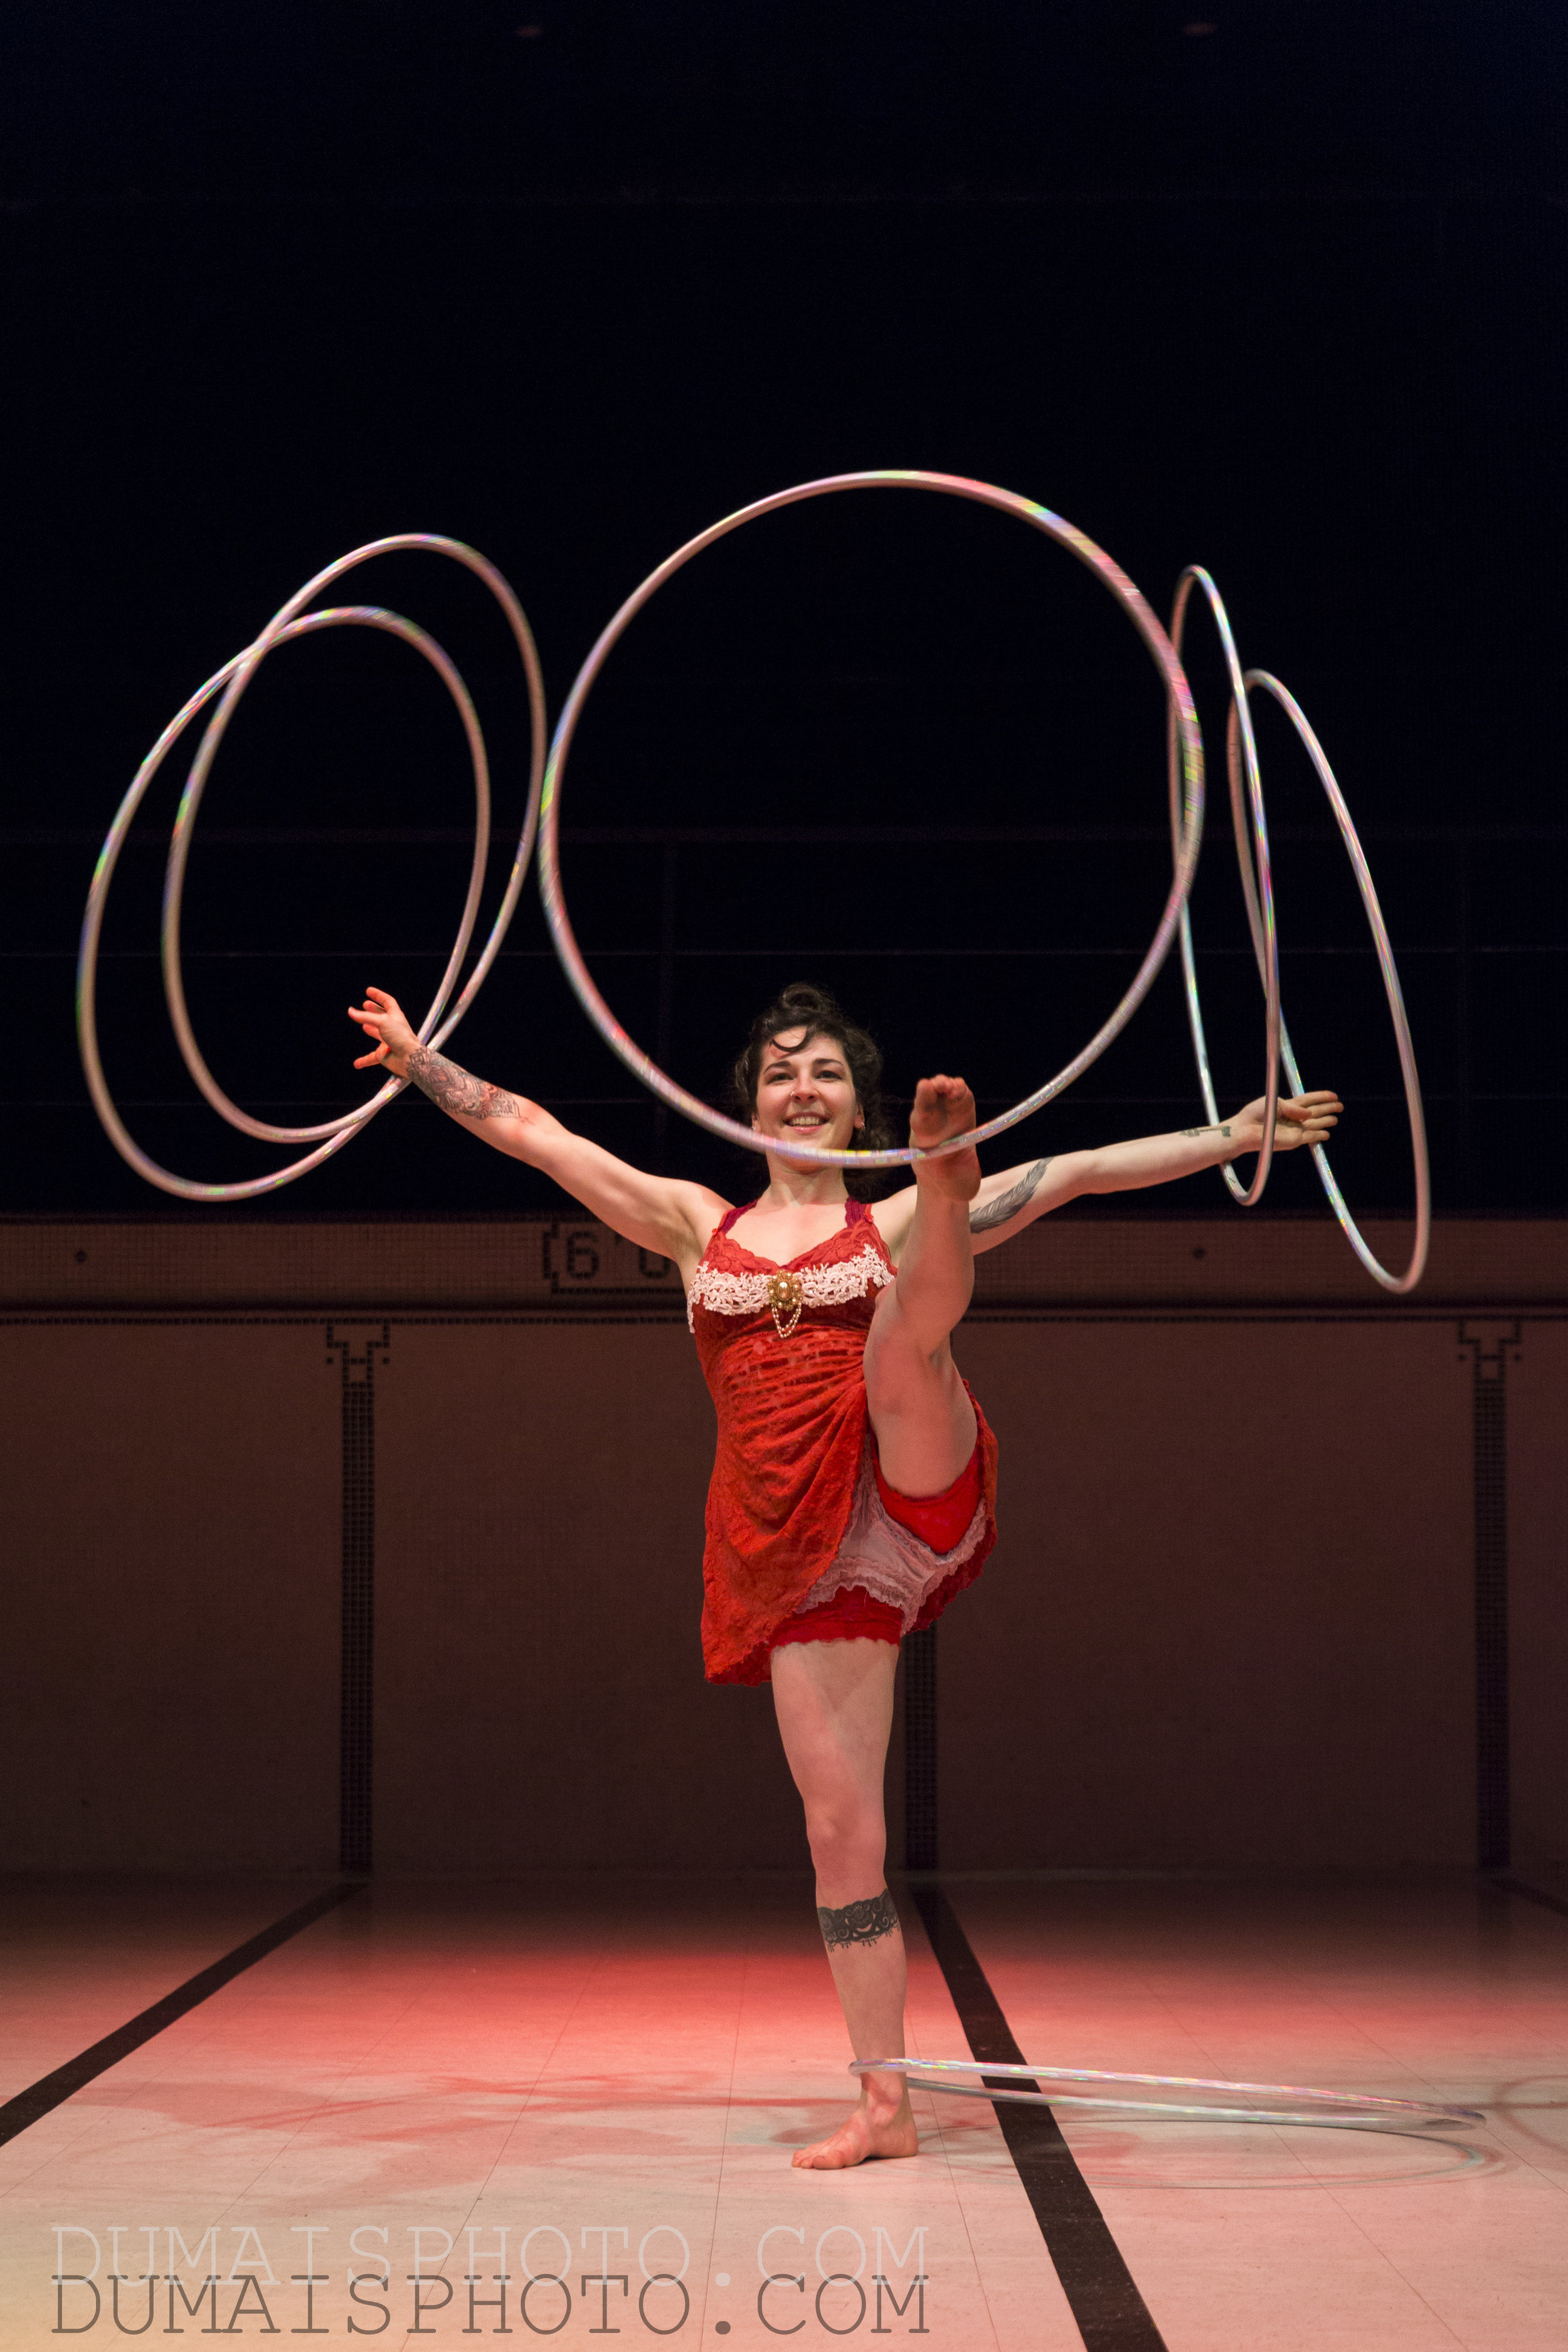 Performance au sol - Hula hoop